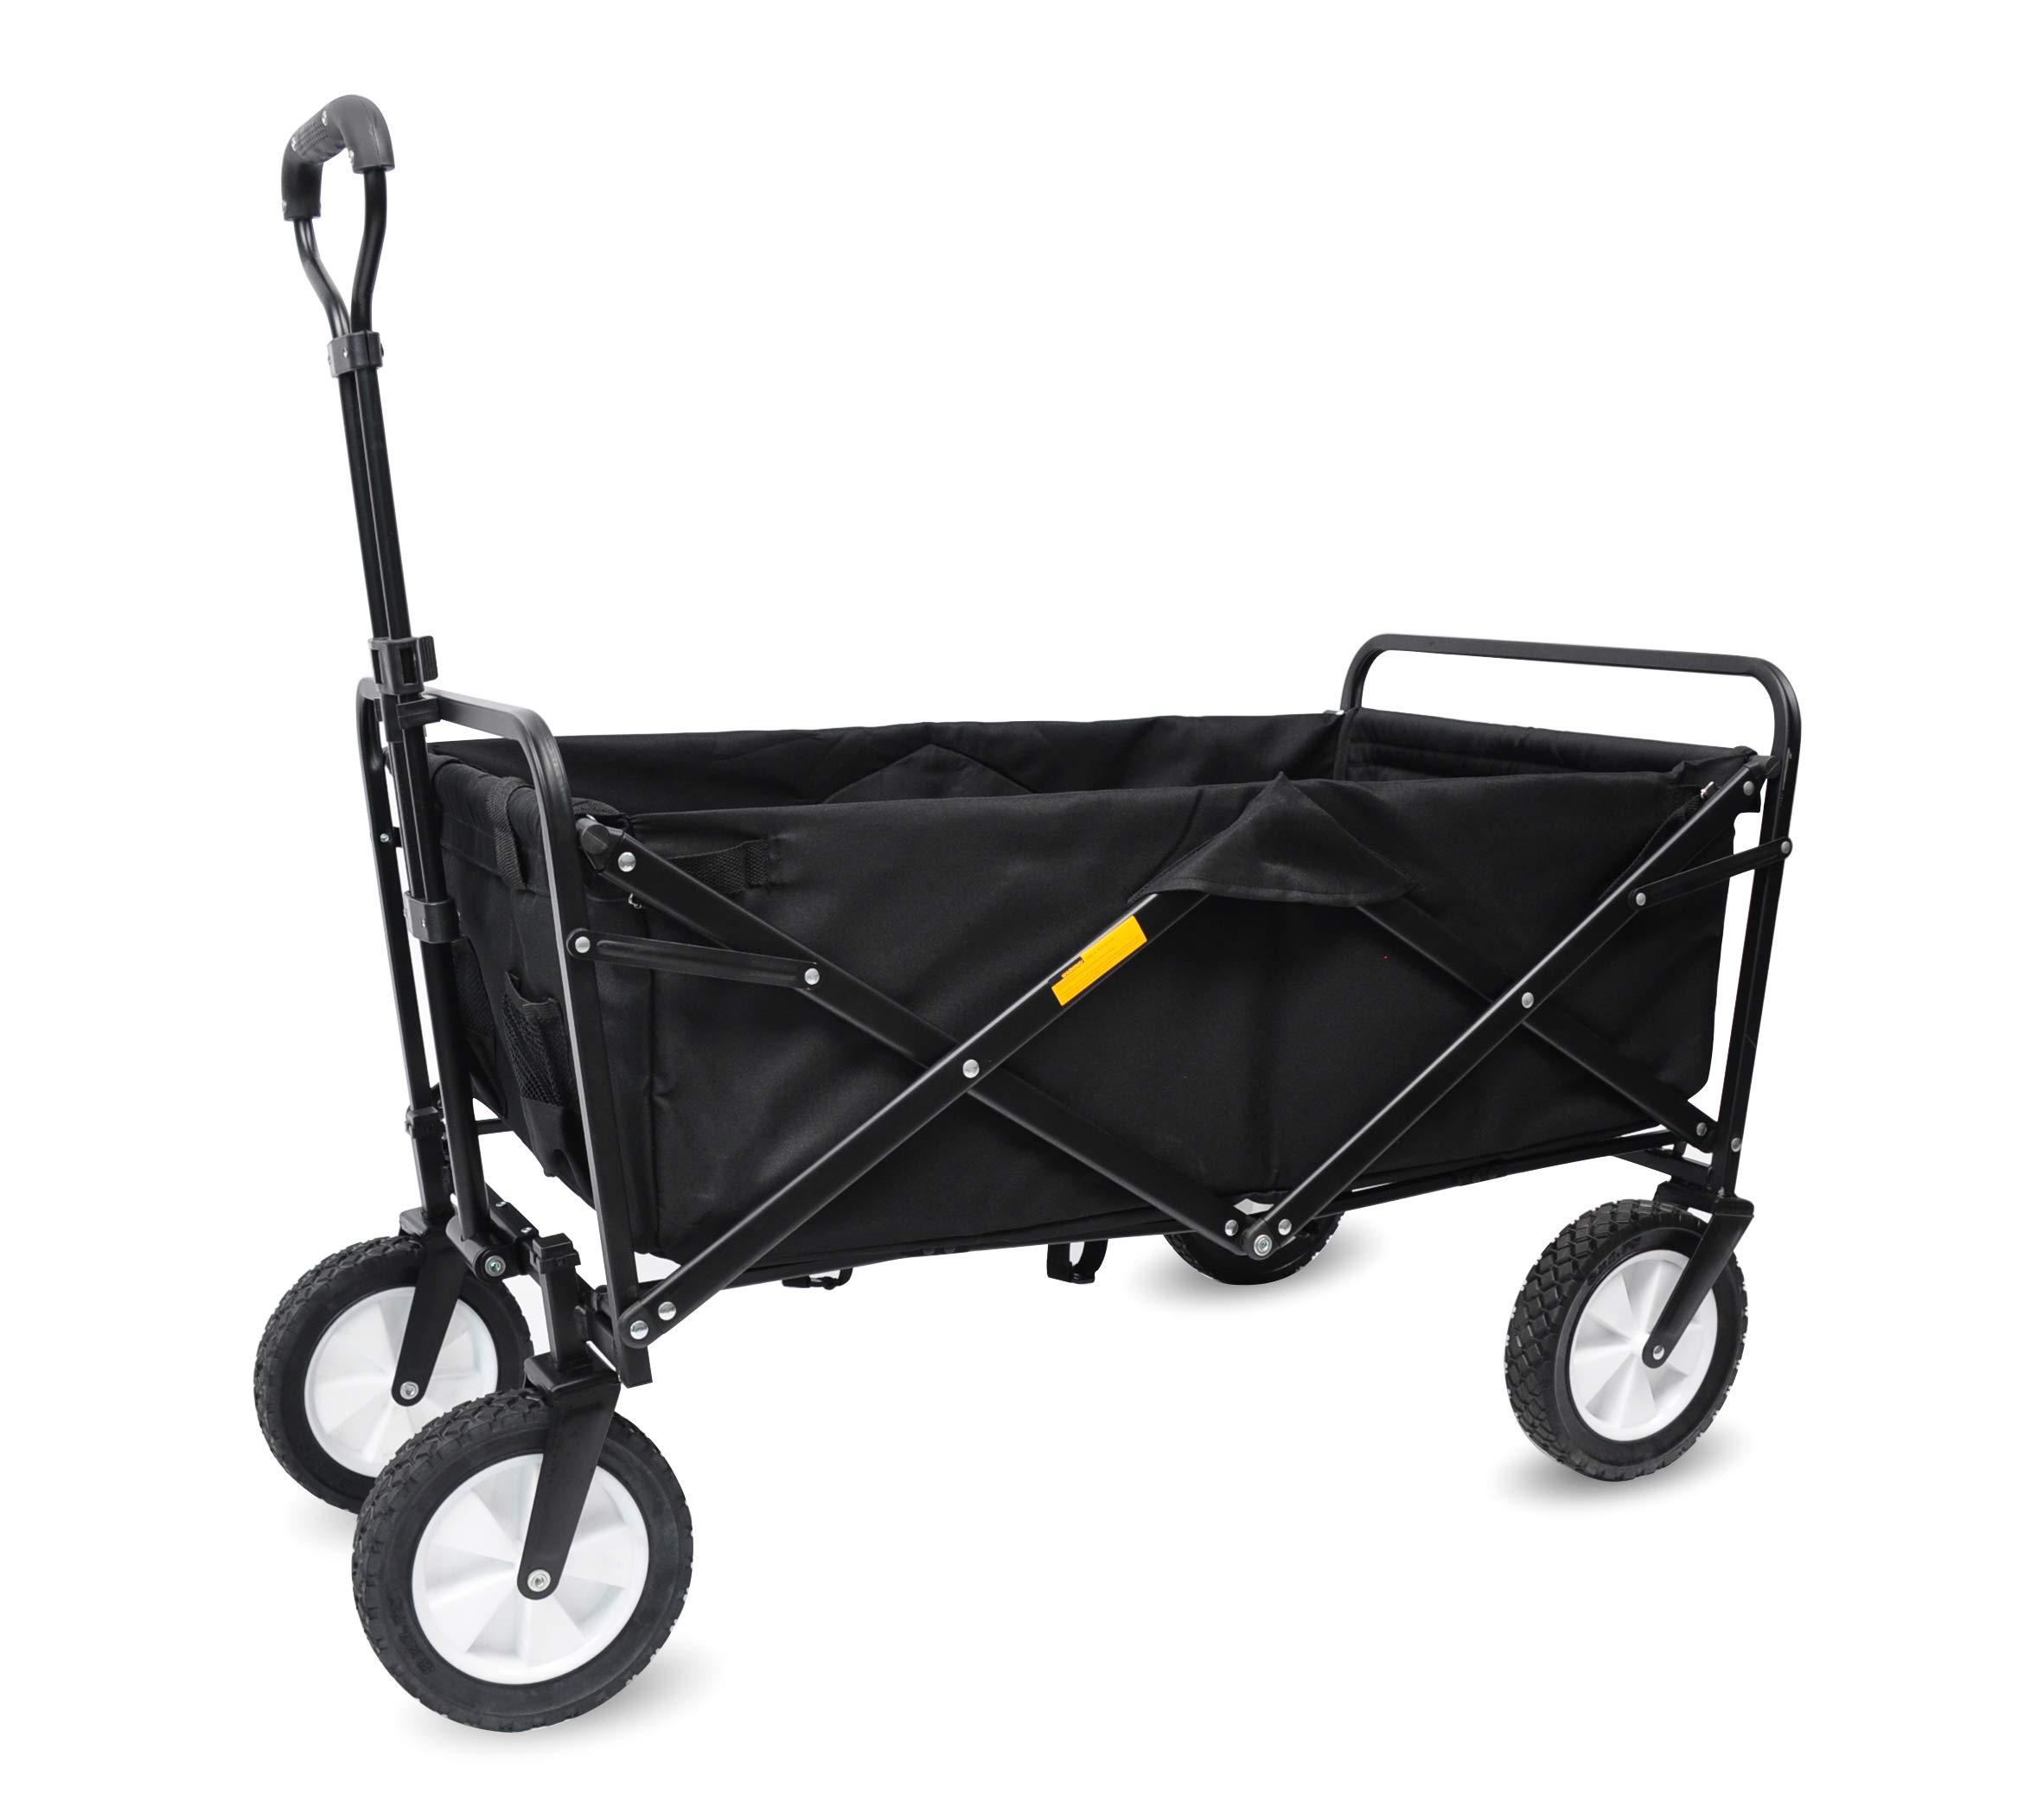 WHITSUNDAY Collapsible Folding Garden Outdoor Park Utility 30'' Picnic Wagon 1 Year Warranty (Black)